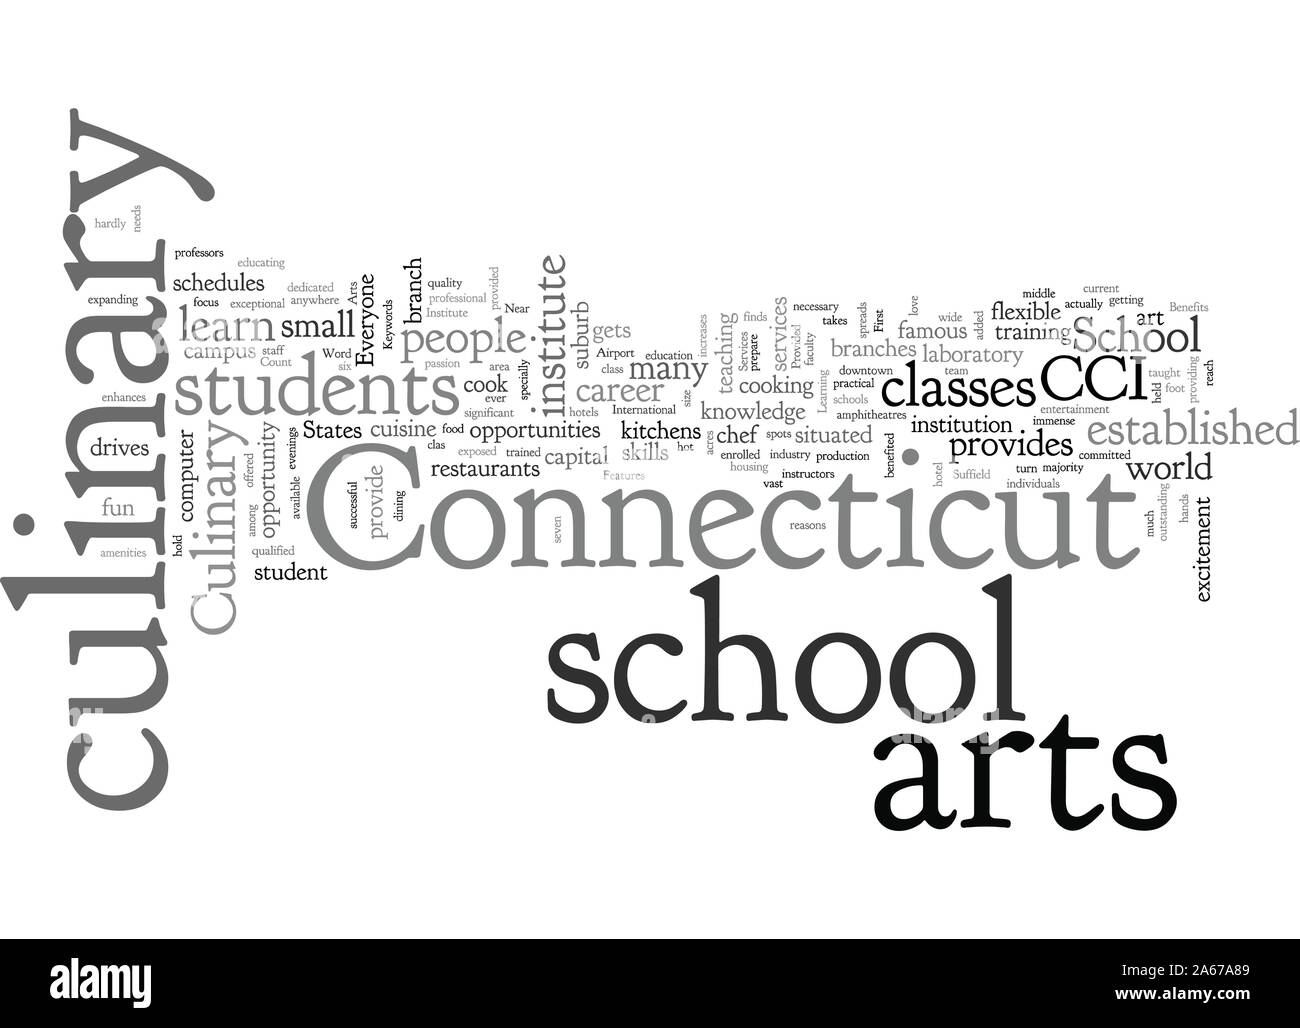 Arts Culinary School In Connecticut Stock Vector